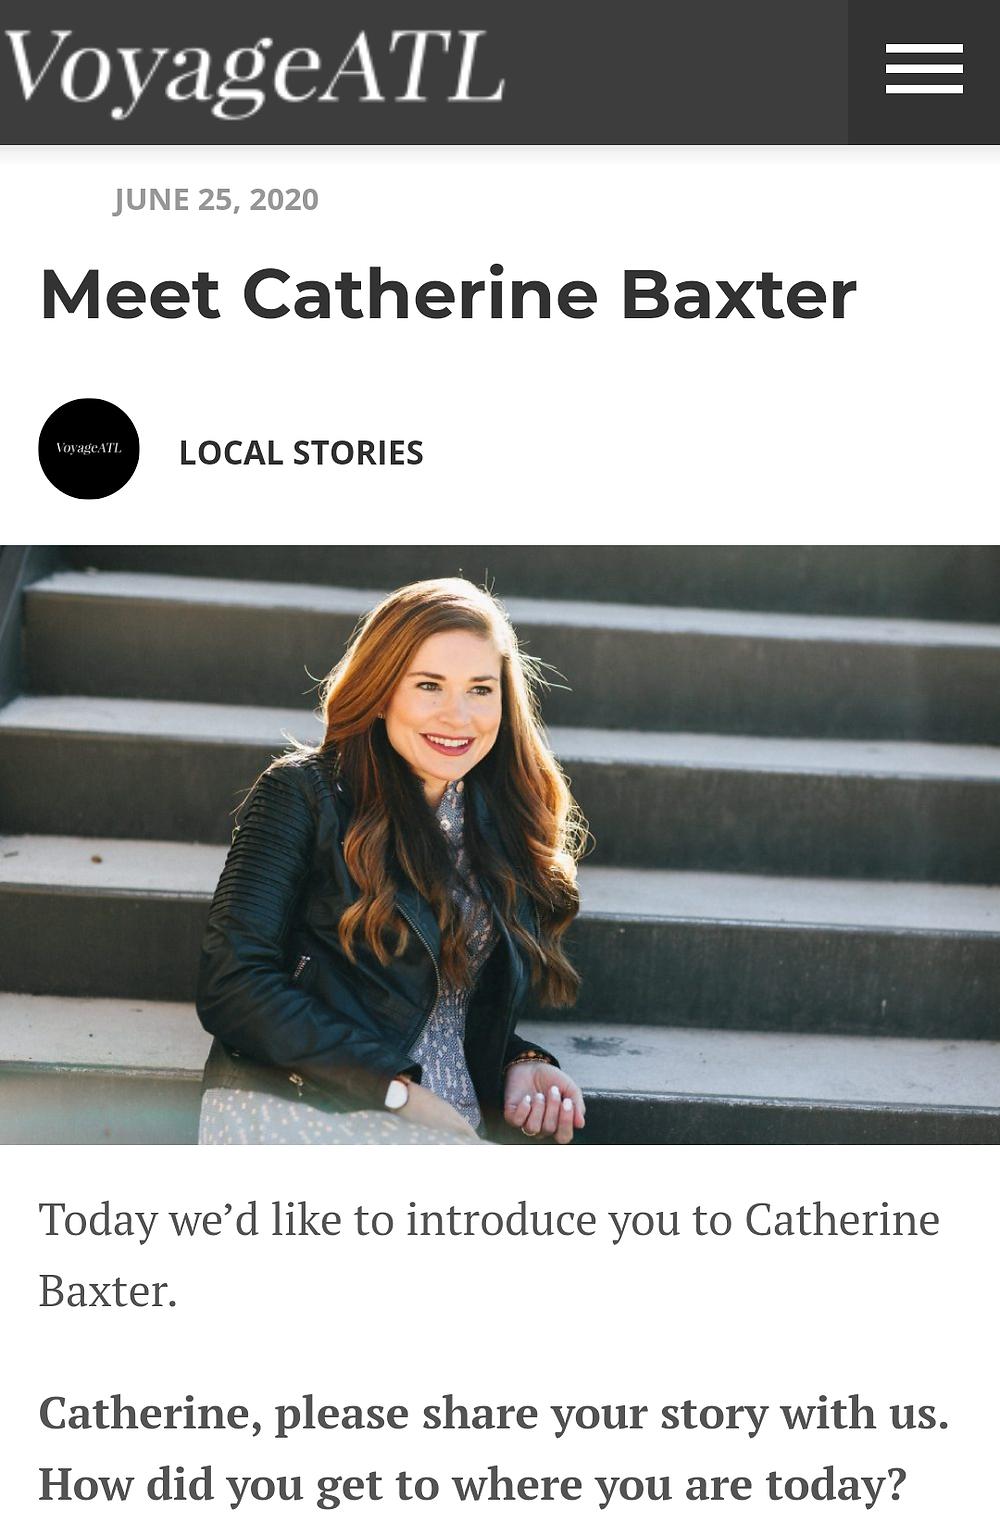 http://voyageatl.com/interview/meet-catherine-baxter-lpc-buckhead/